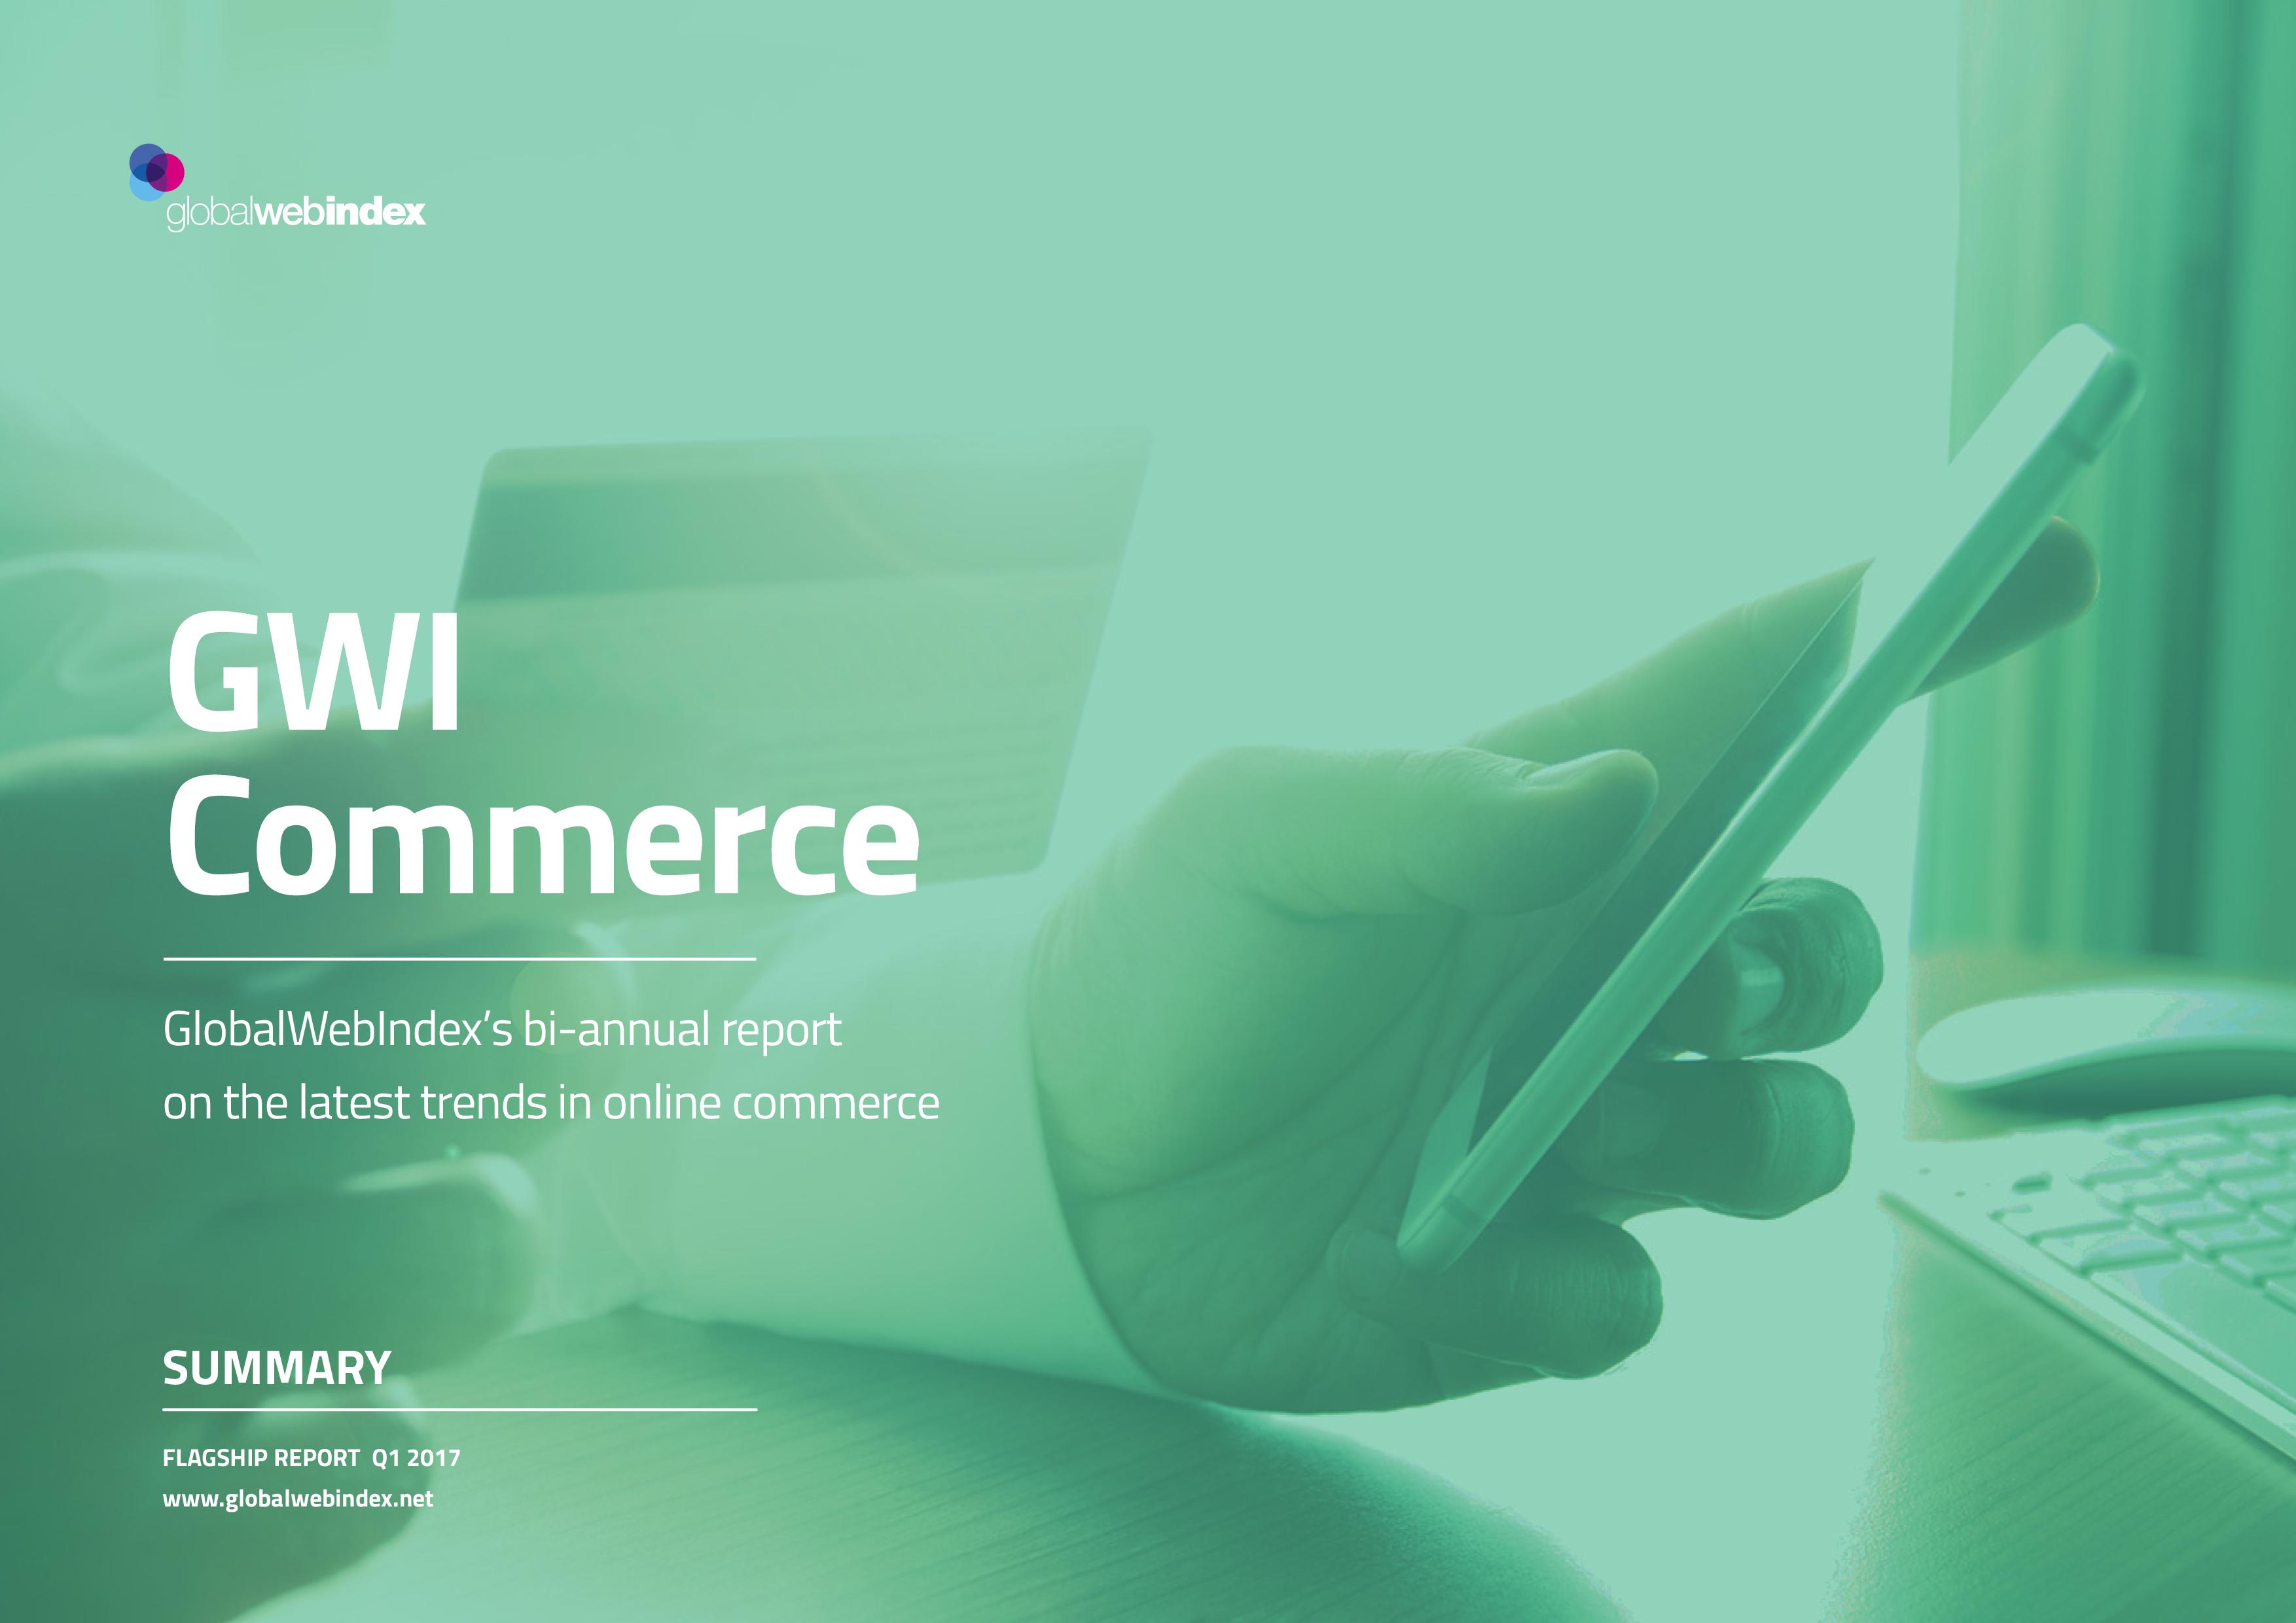 Commerce Q1 2017 Summary Report